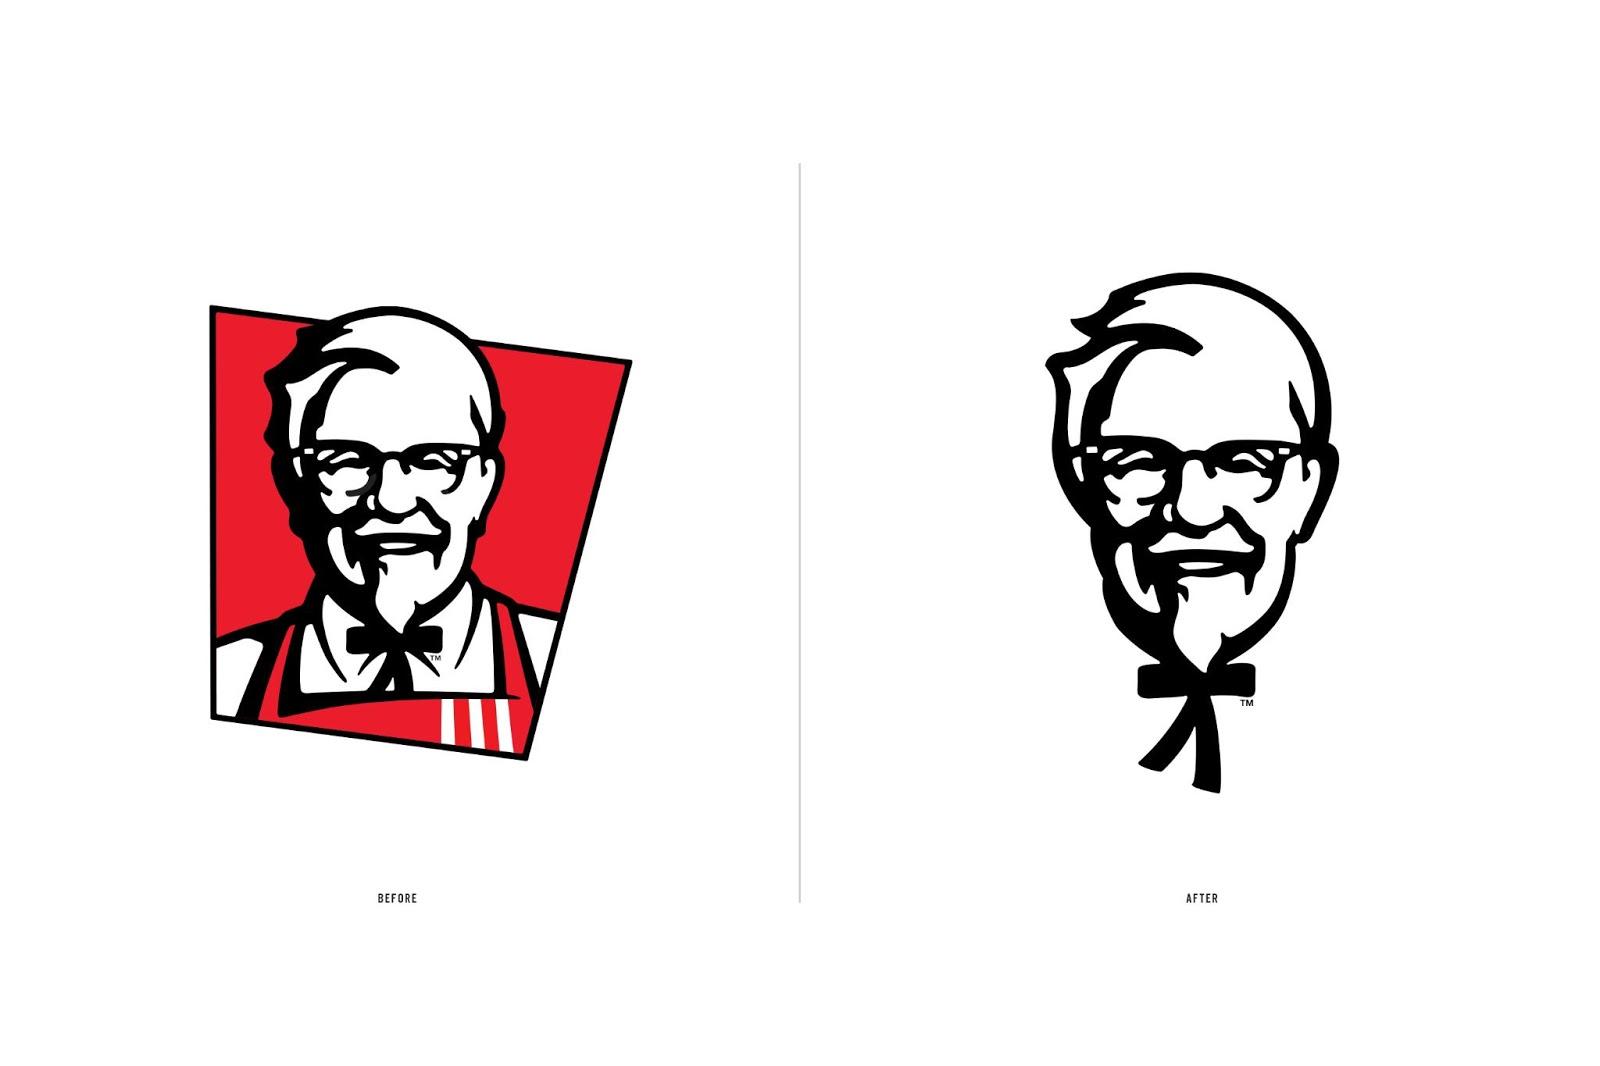 Kfc Rebrand New Versus Old Logo Ehroo